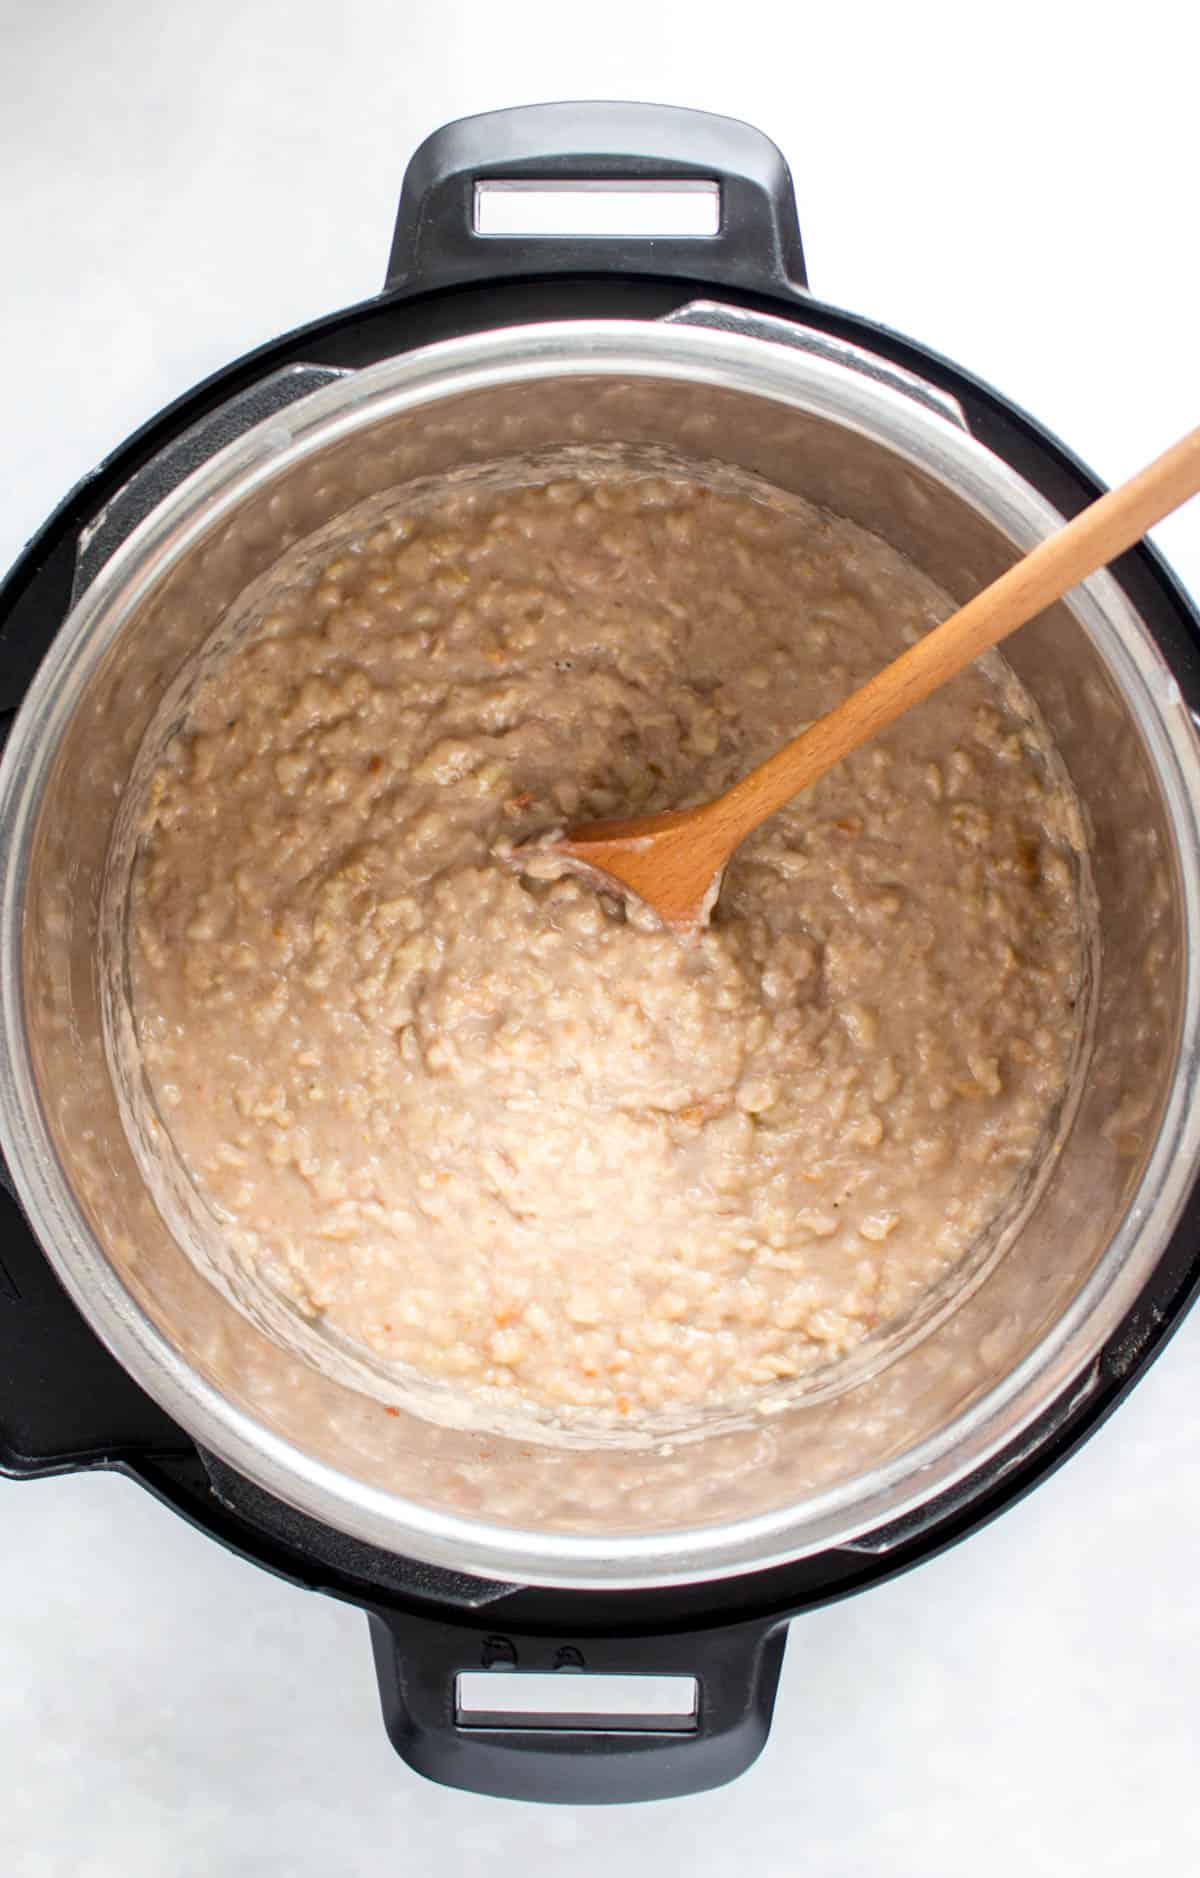 Mixed banana bread oatmeal in an Instant Pot.